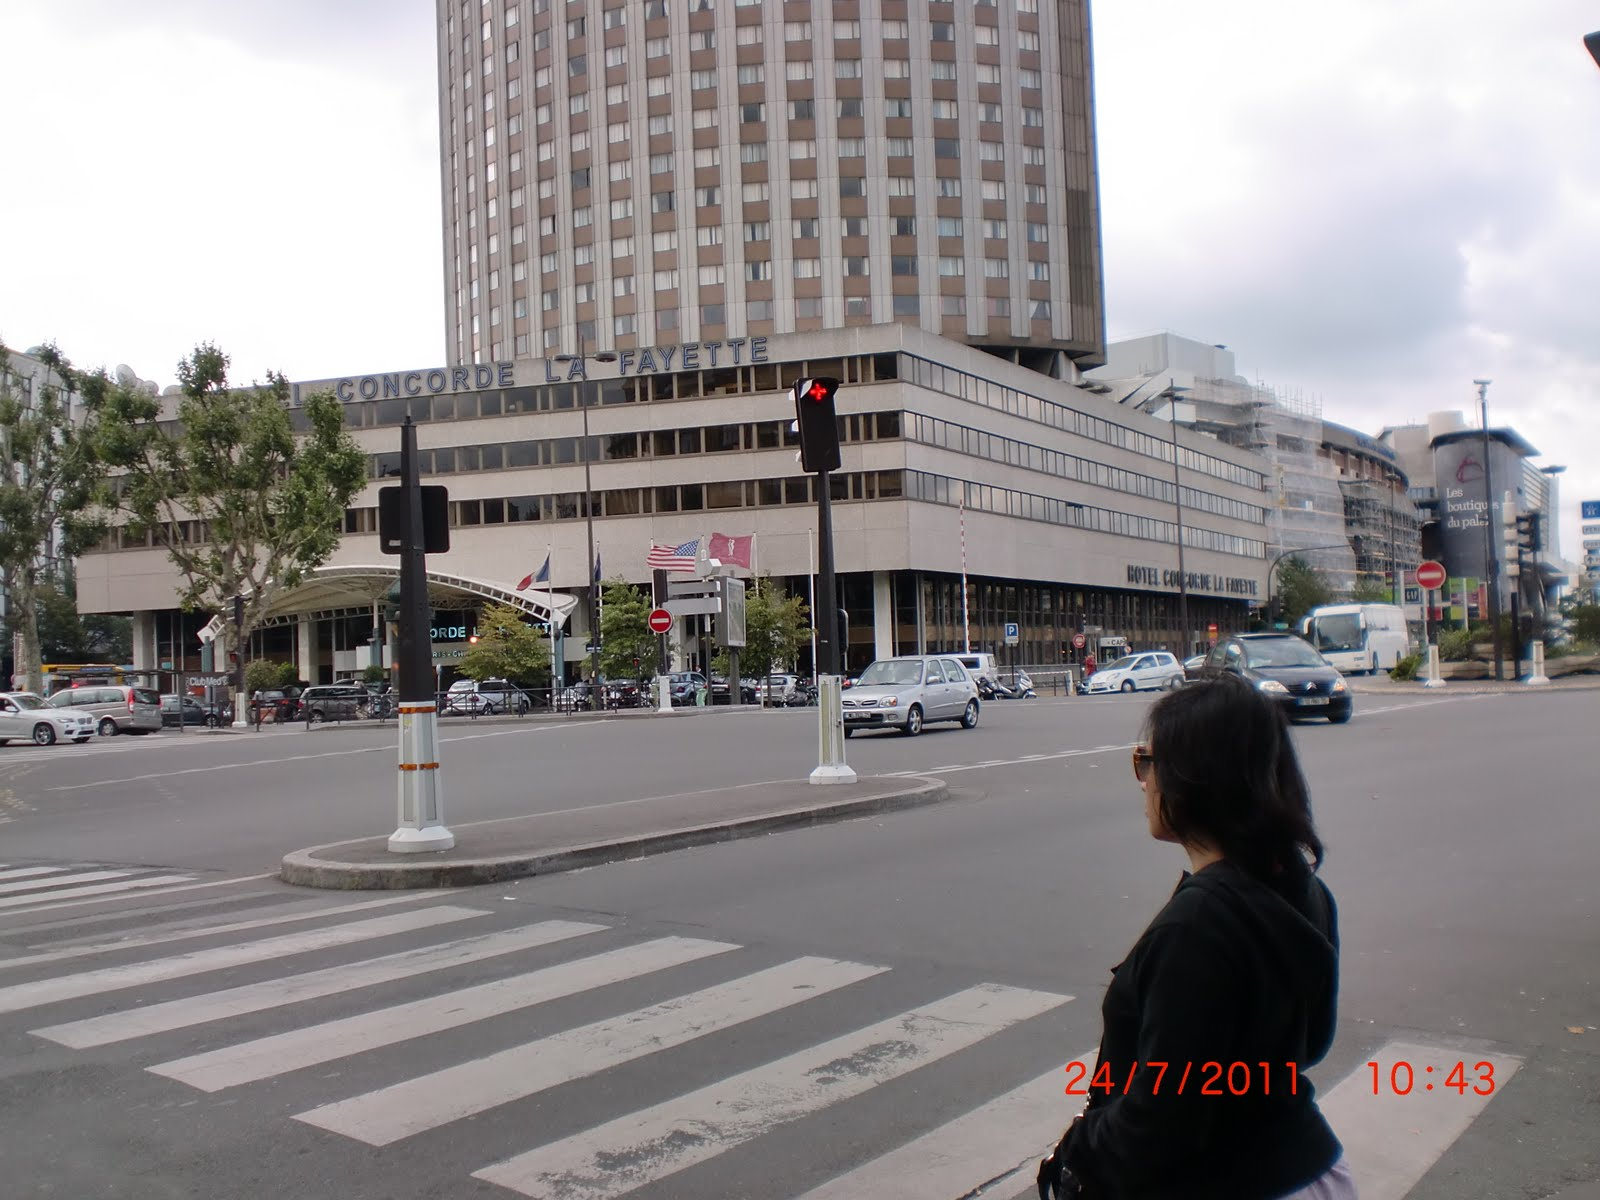 Hotel Concorde La Fayette Paris Booking